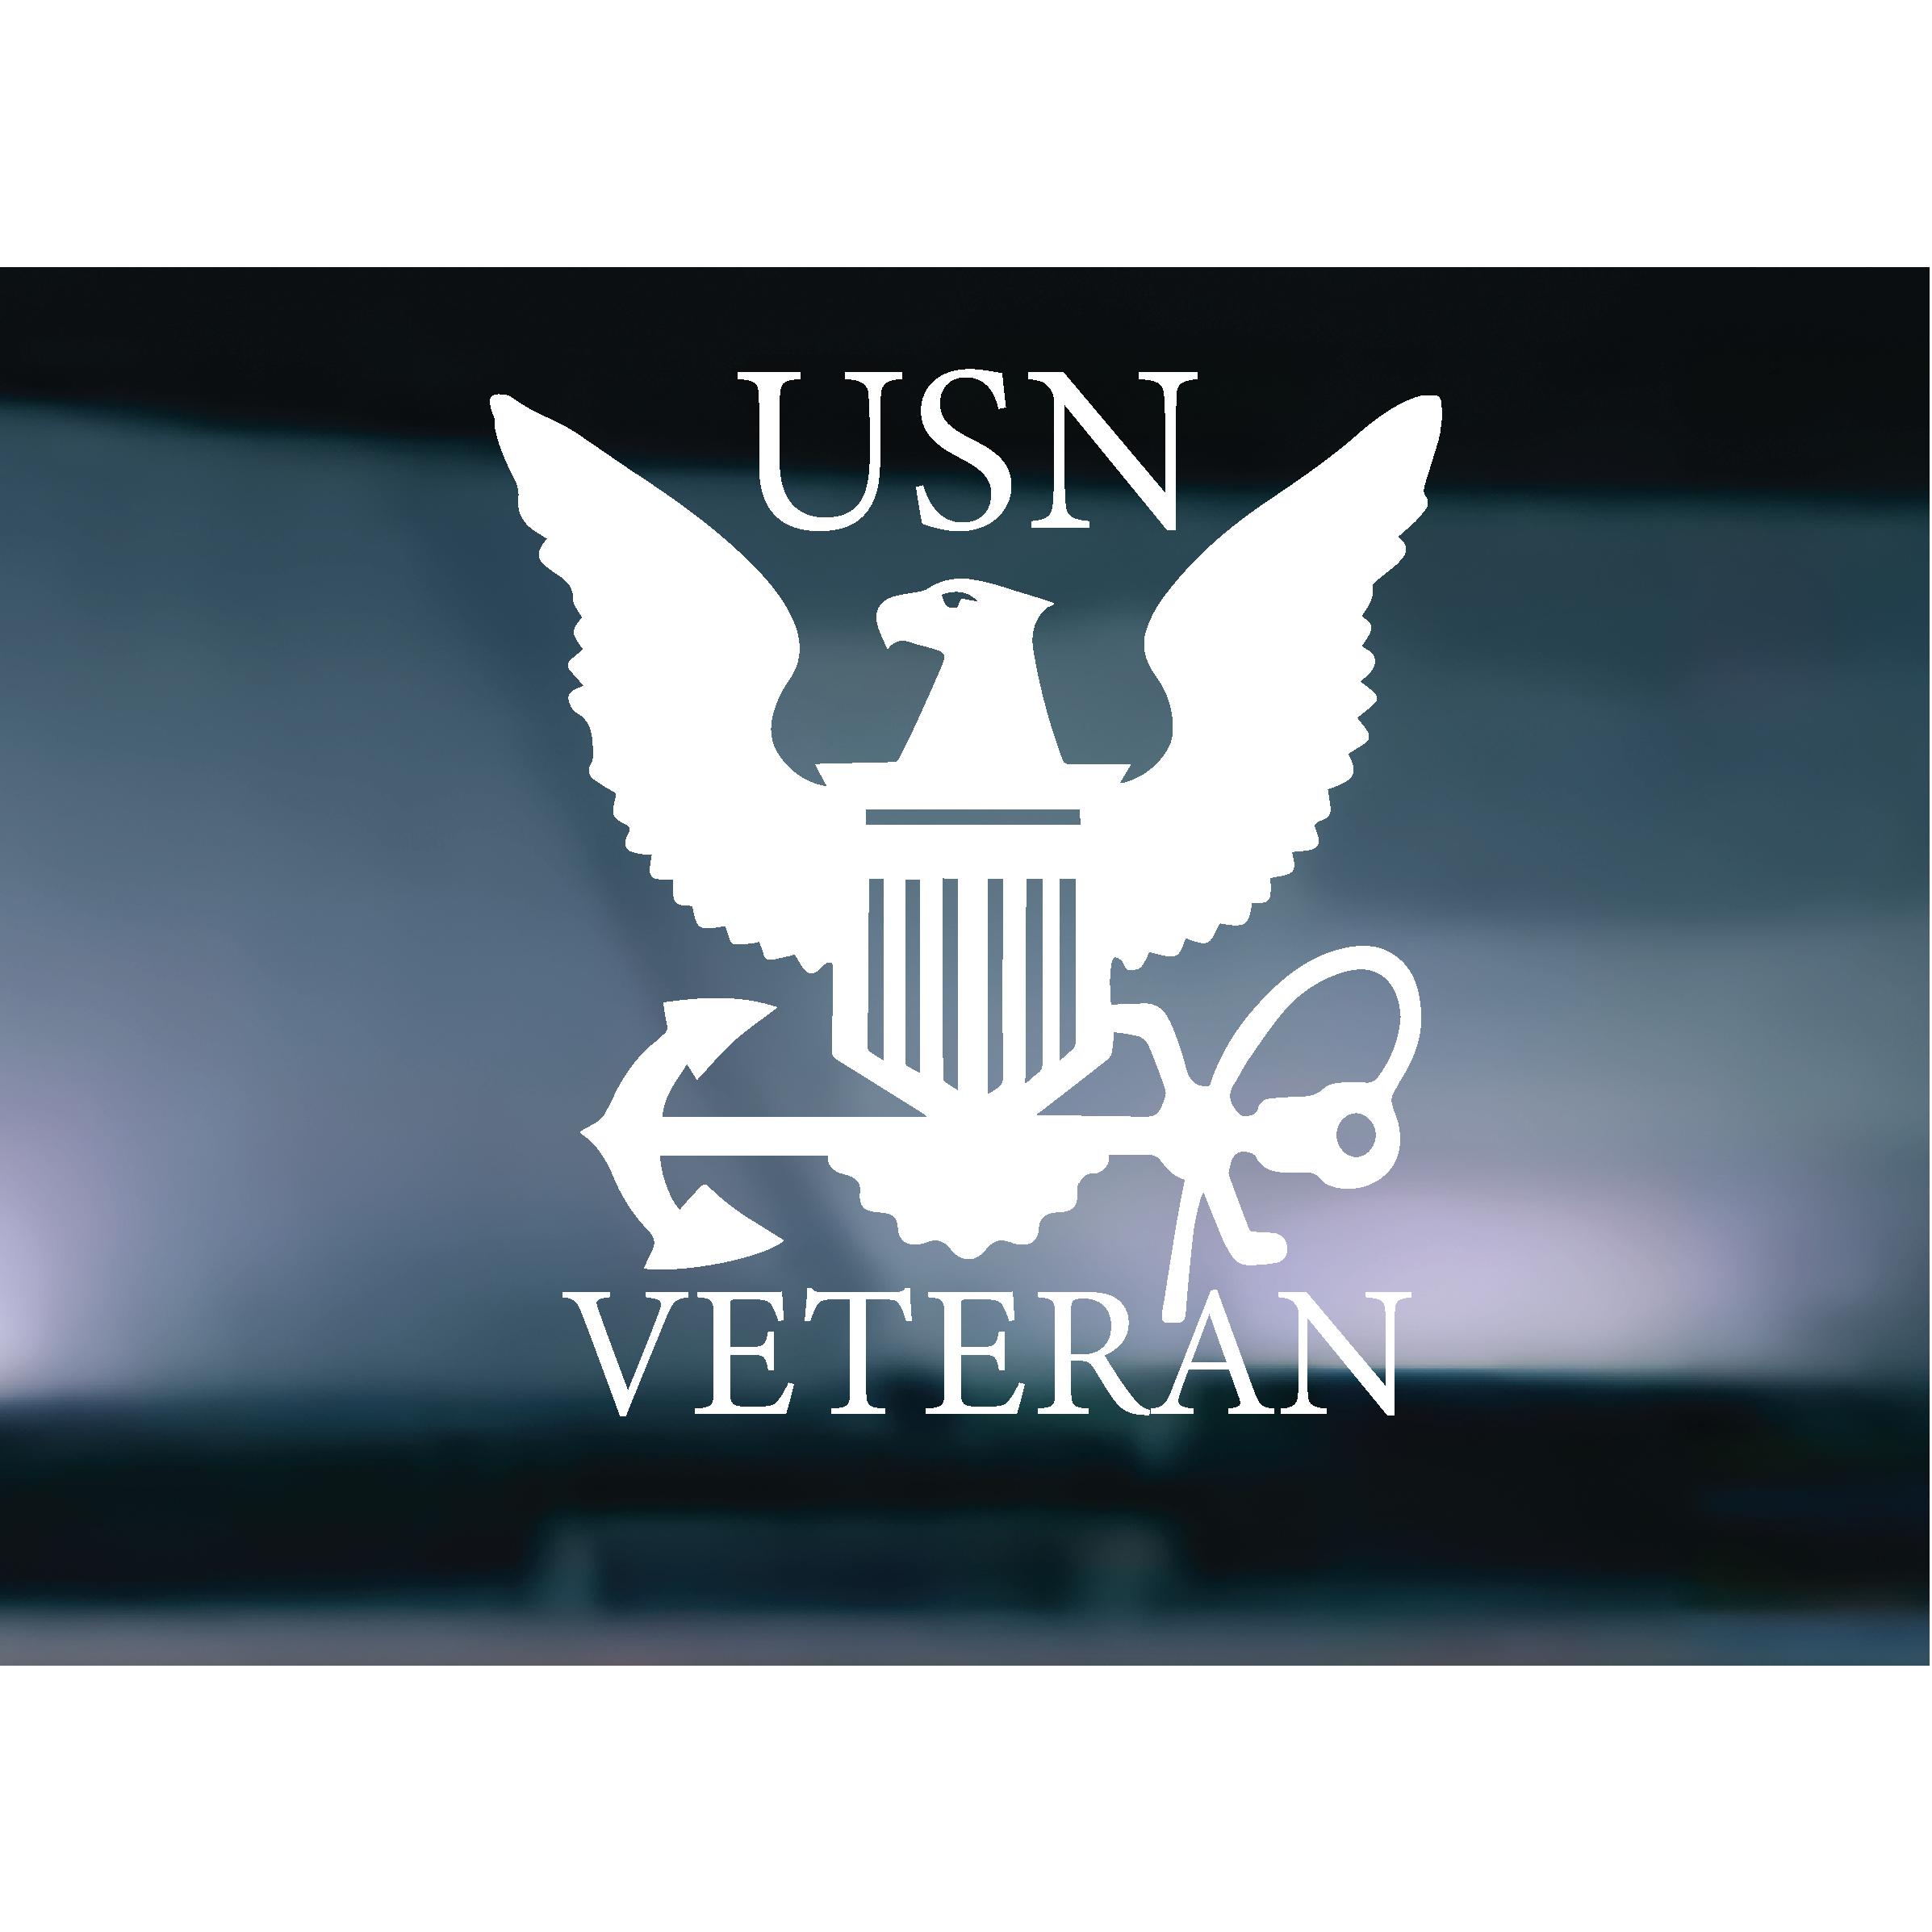 U.S Marine Veteran Vinyl Decal Laptop SUV Car Truck Window Cooler FREE DECAL